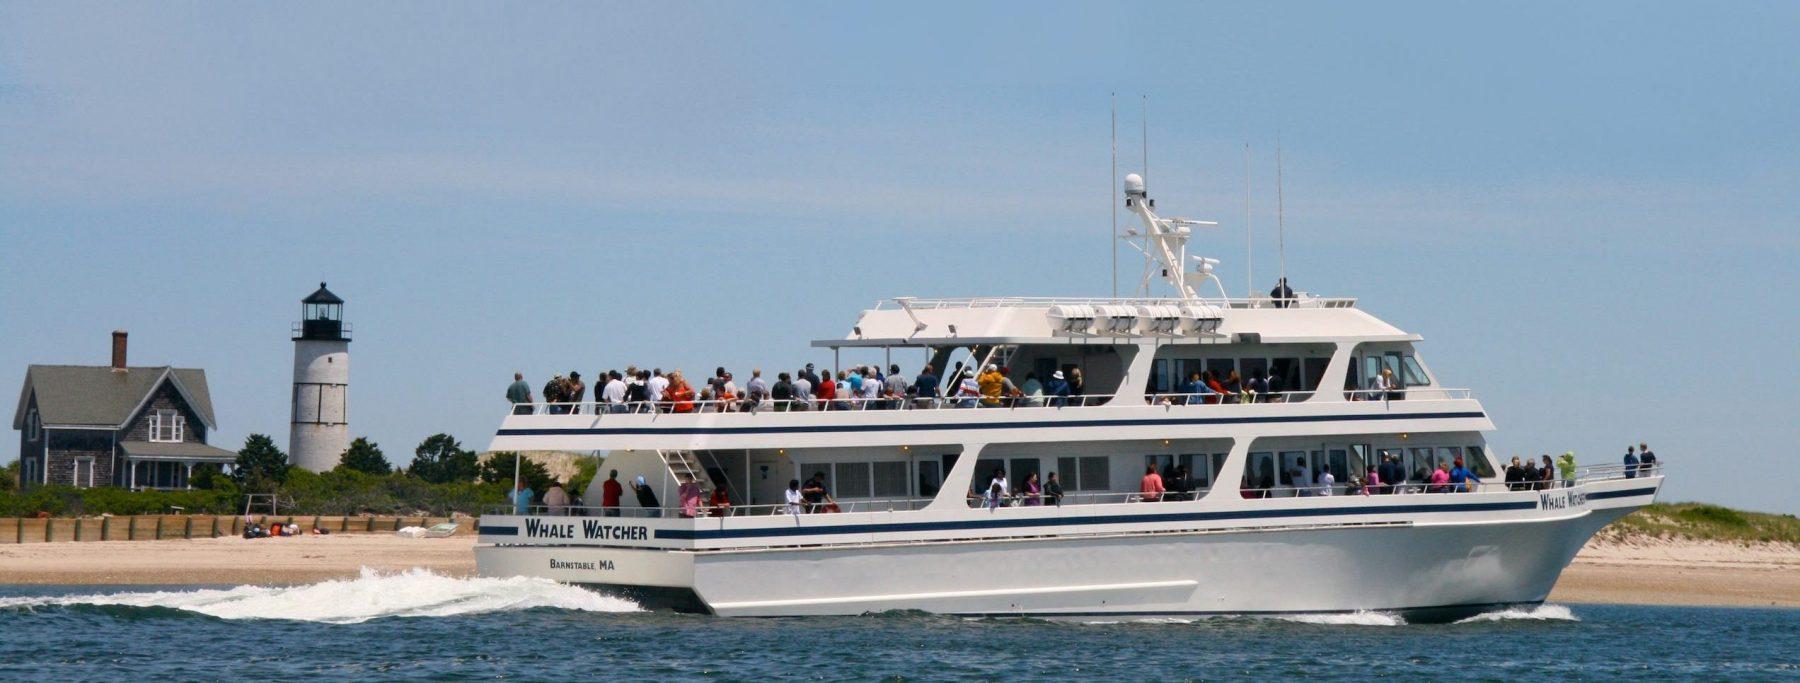 whale watcher passes Sandy Neck